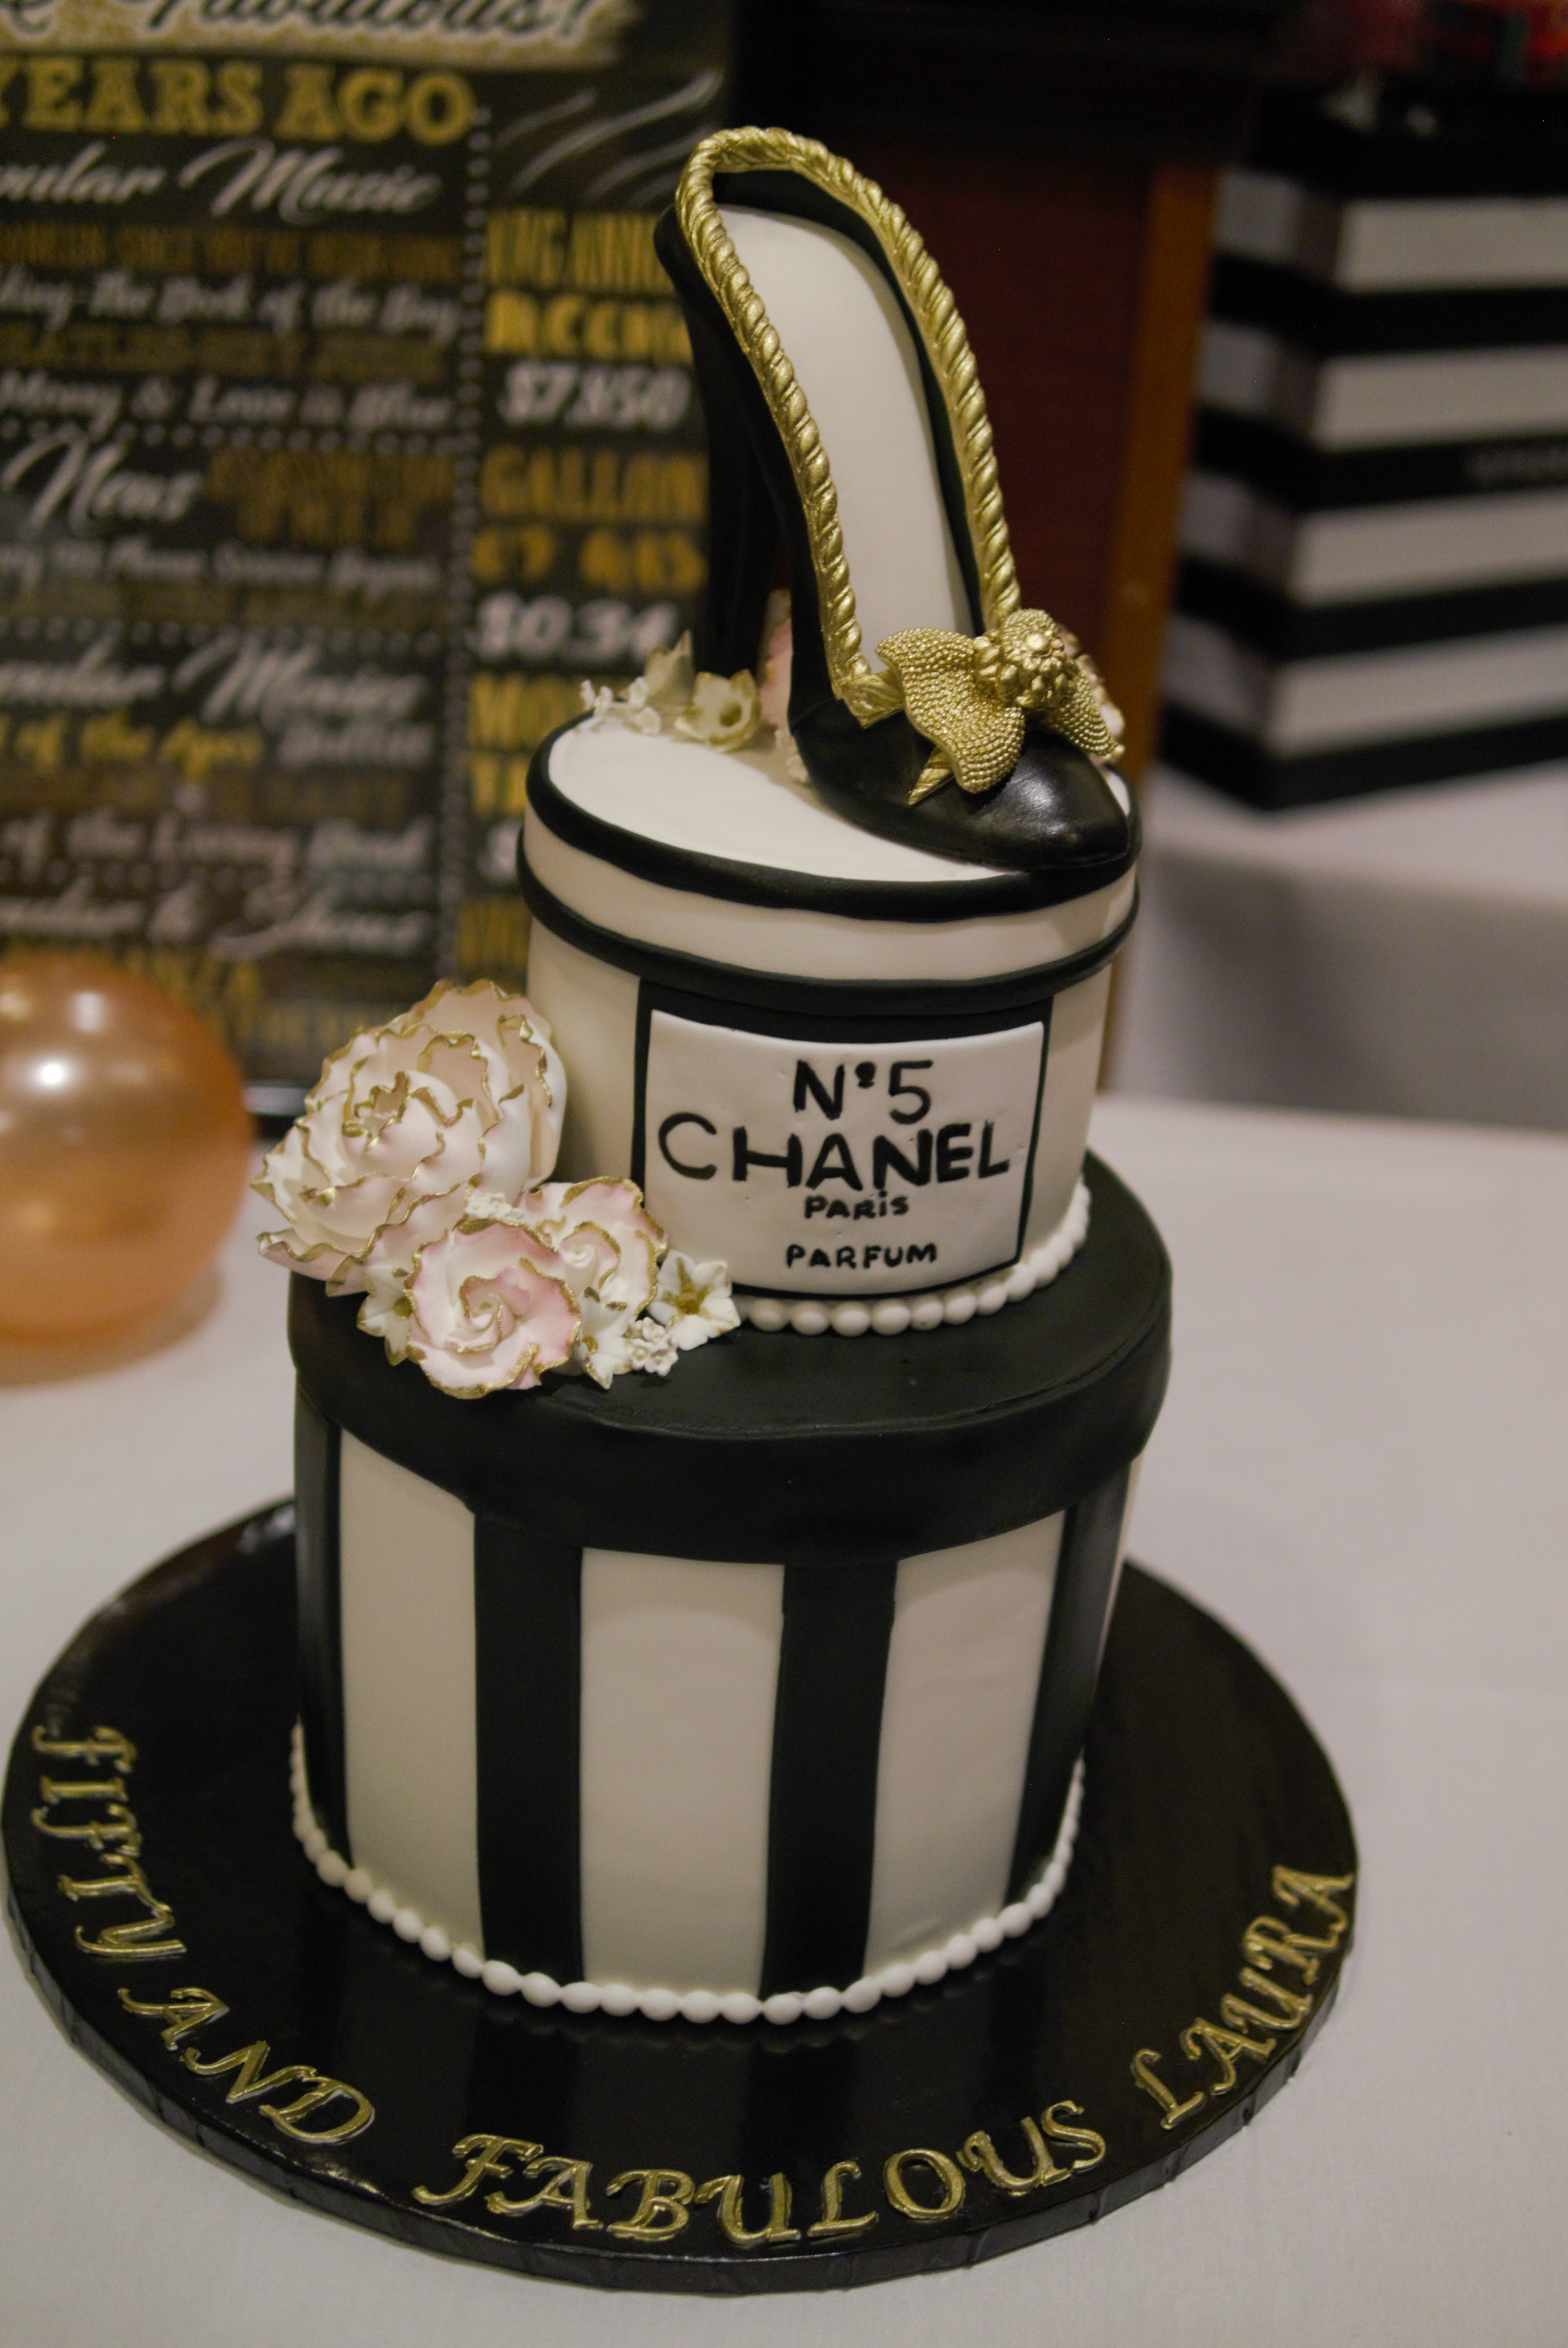 The Classy Birthday Cake